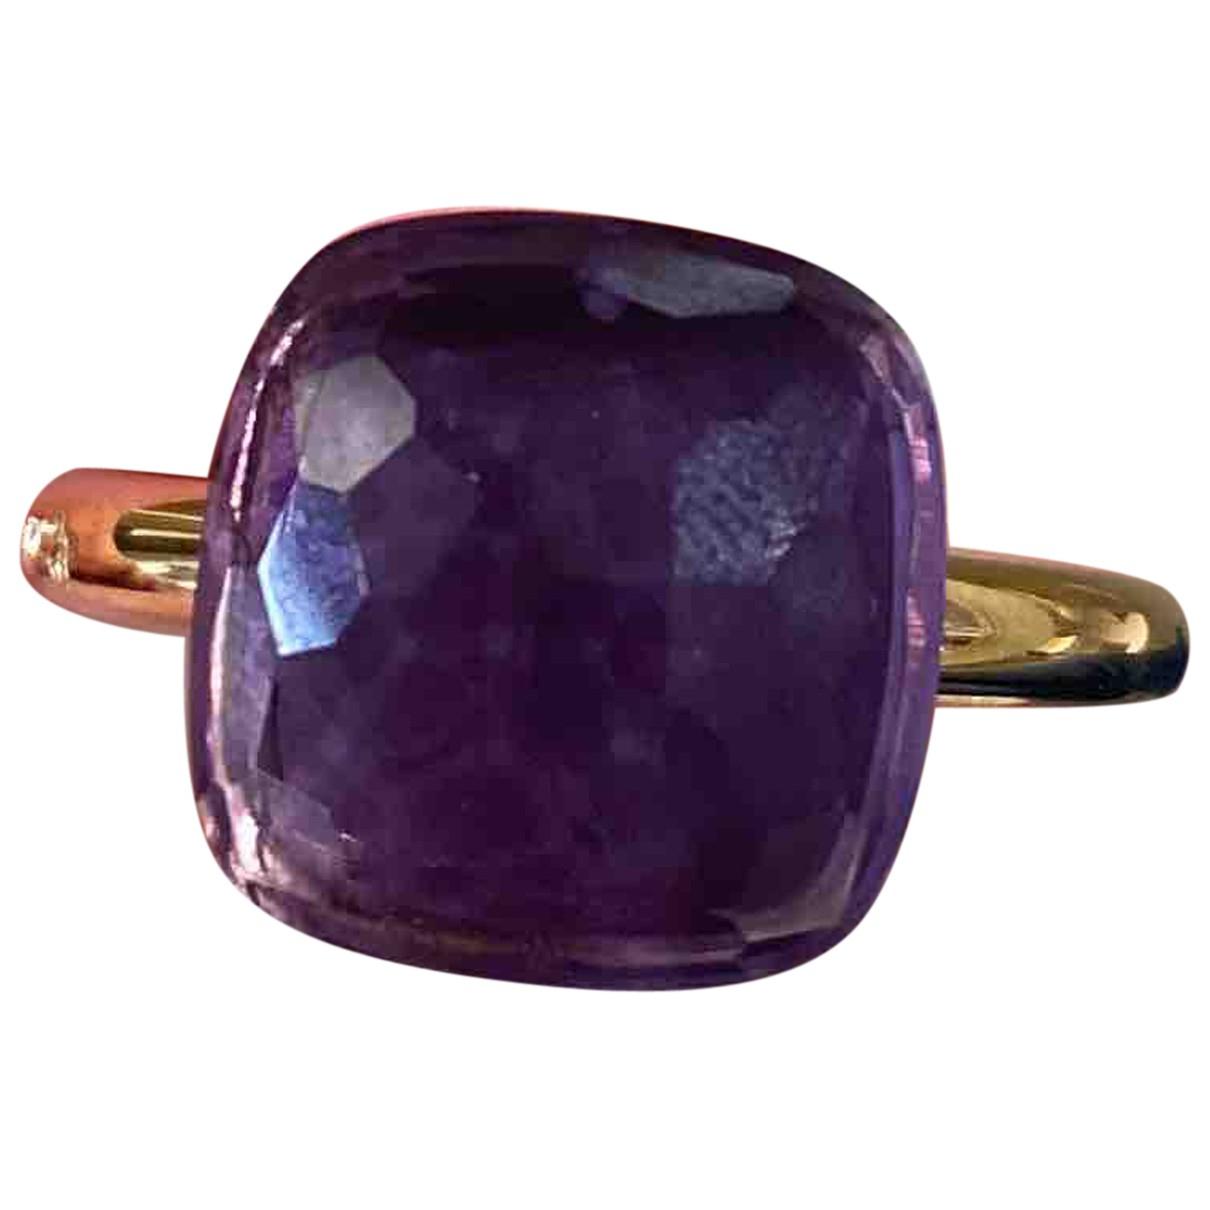 Pomellato - Bague Nudo pour femme en or rose - violet